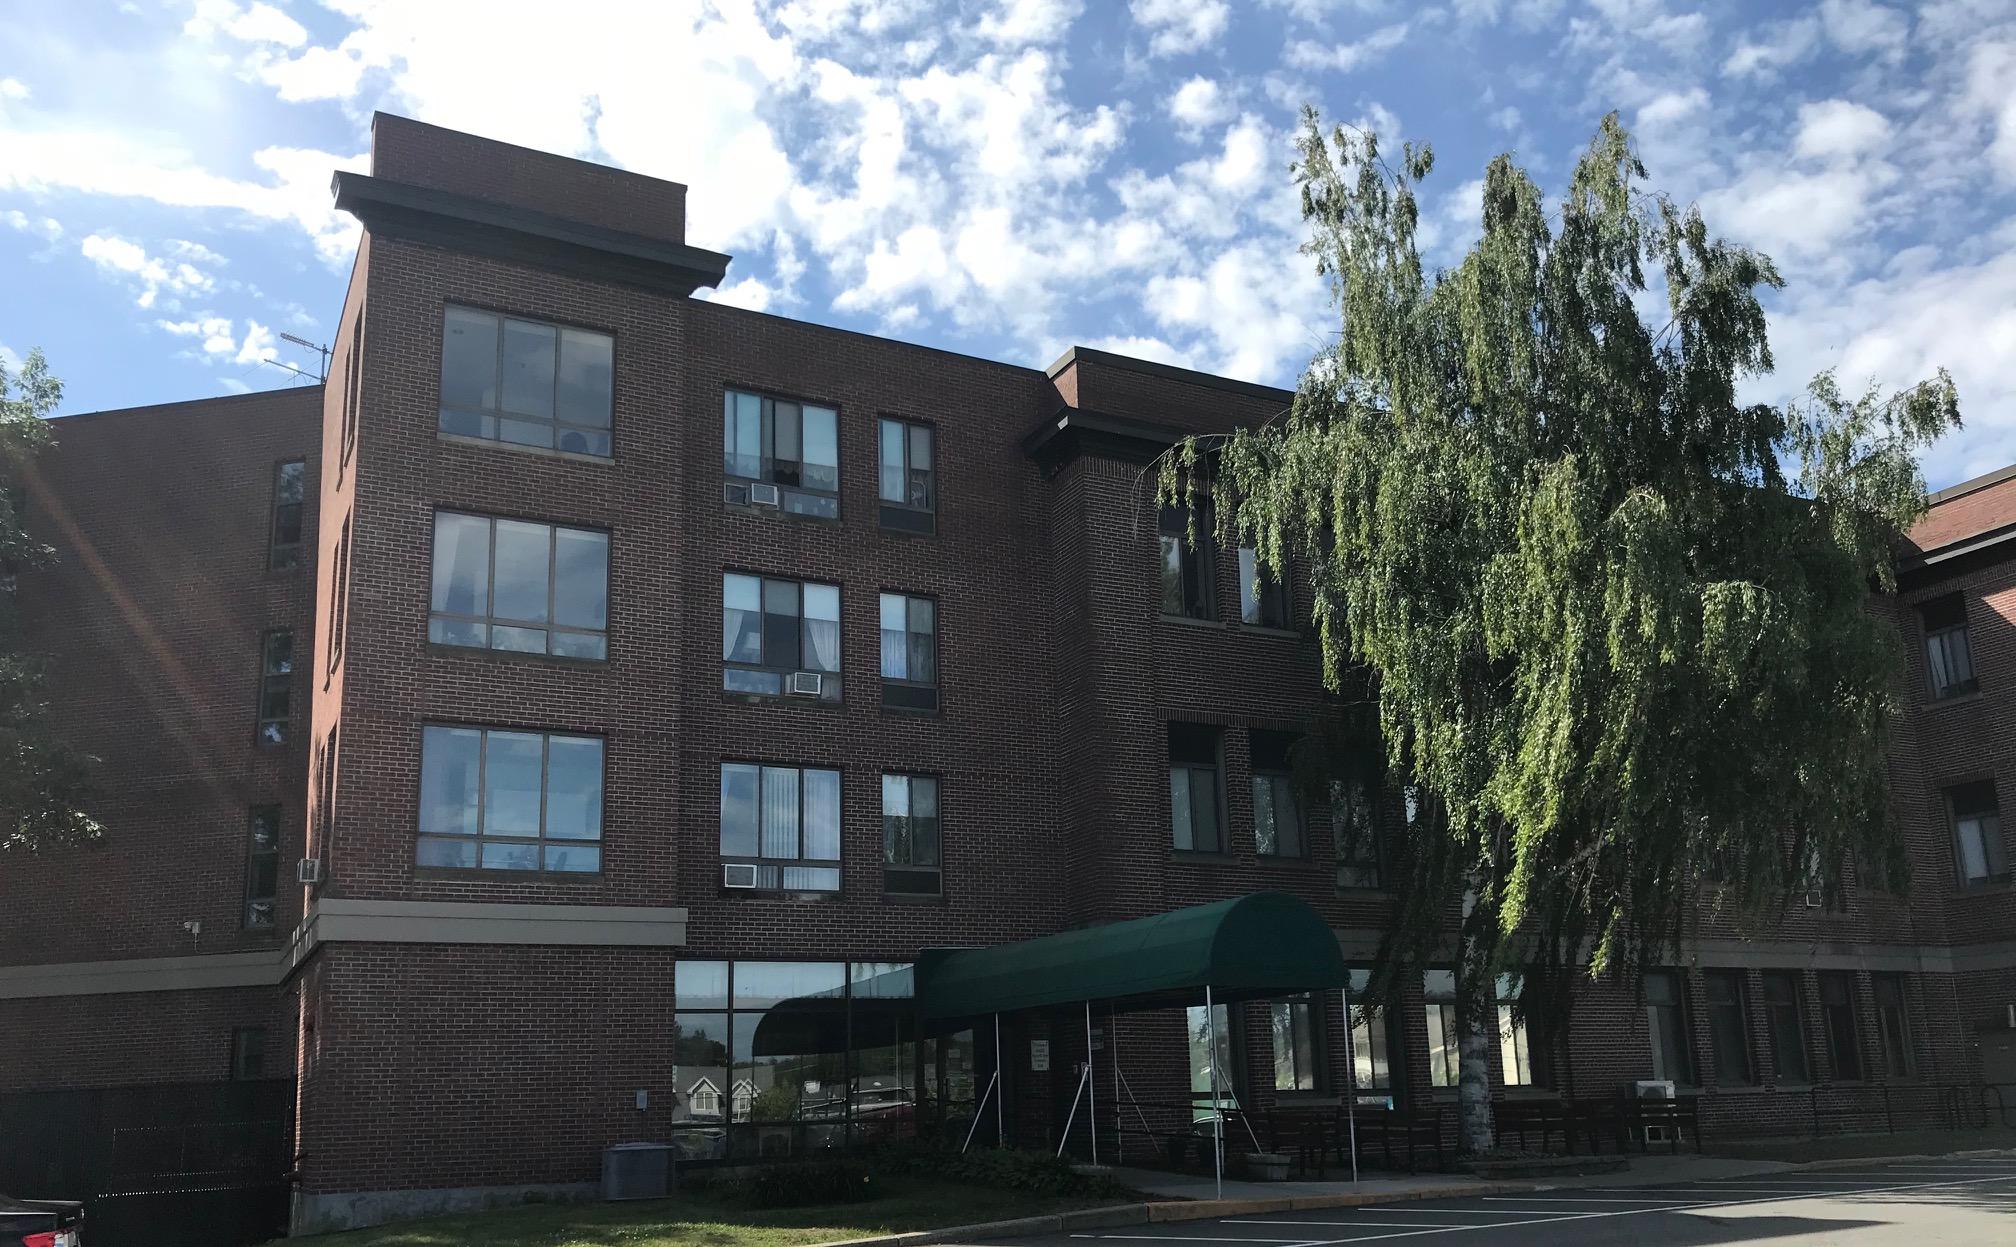 Elderly Housing – Chelmsford Housing Authority